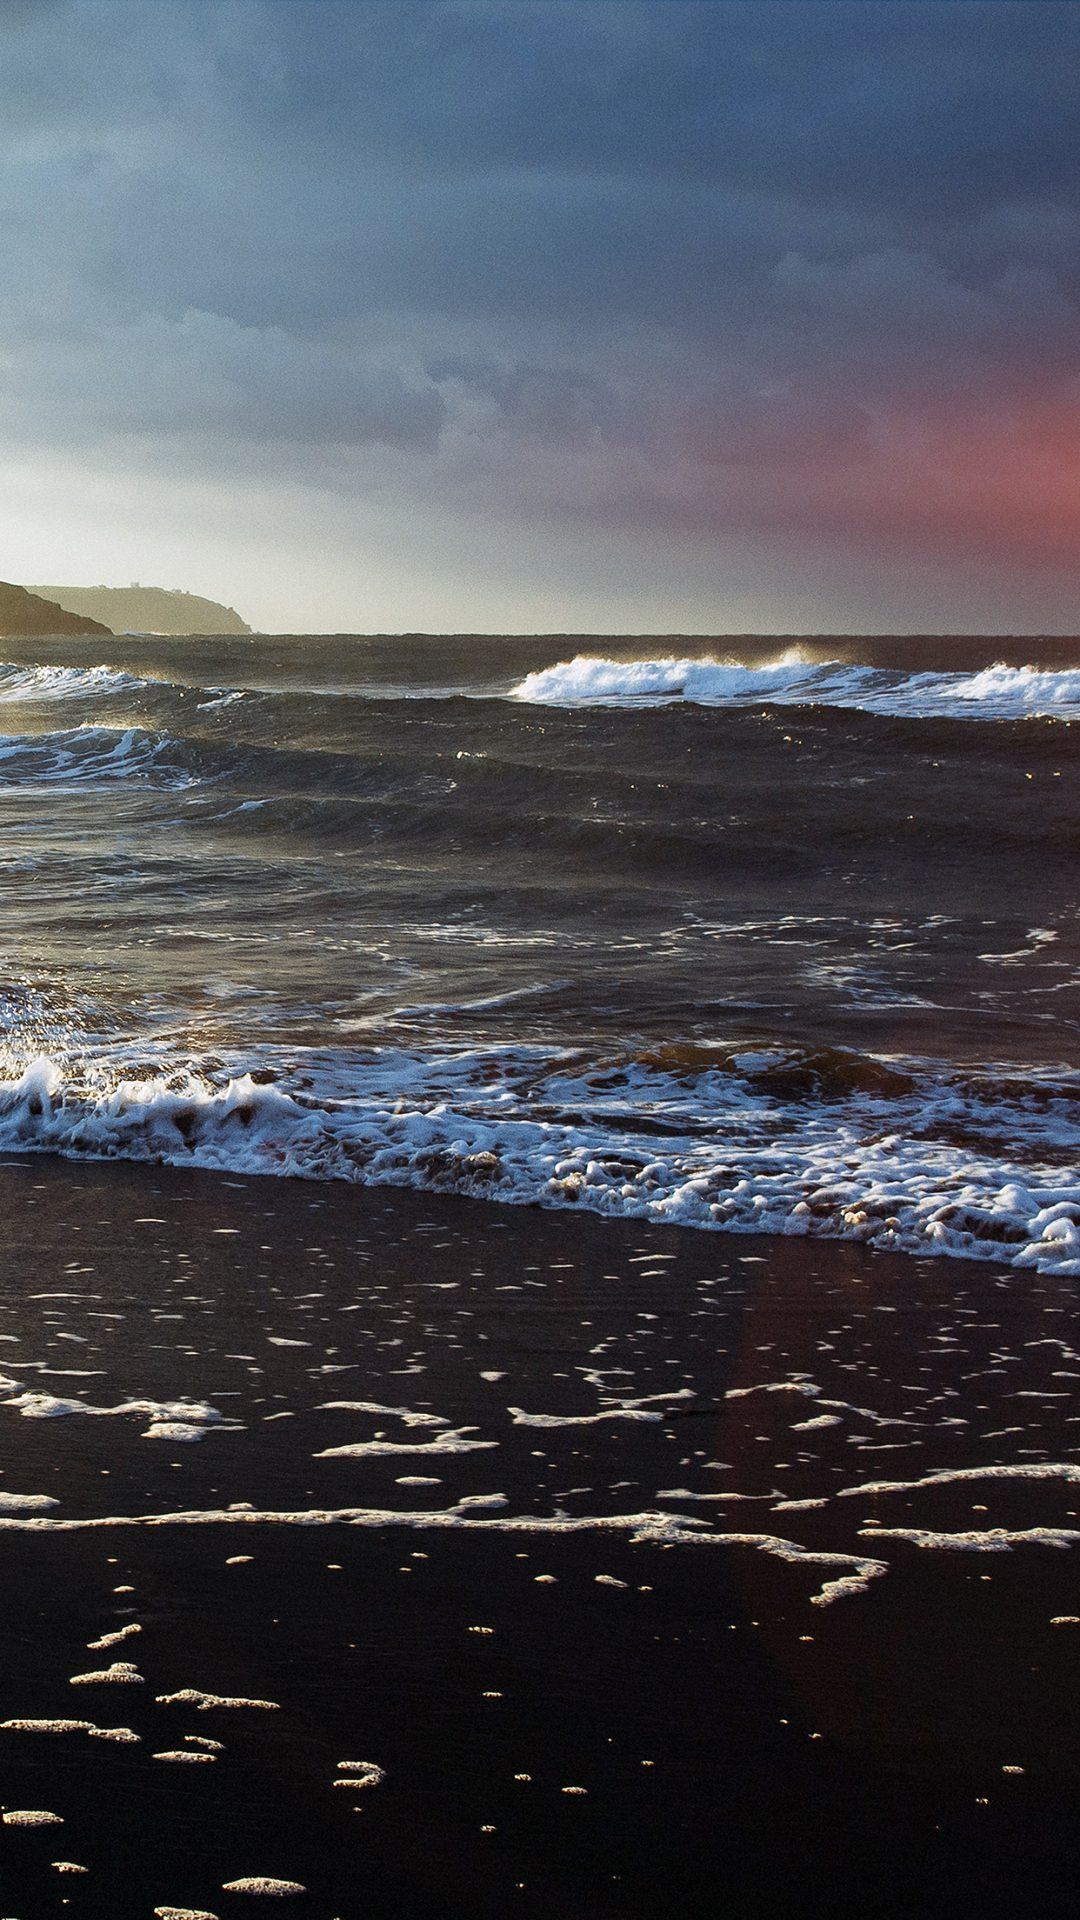 Beach Costal Nature Sea Water Summer Flare